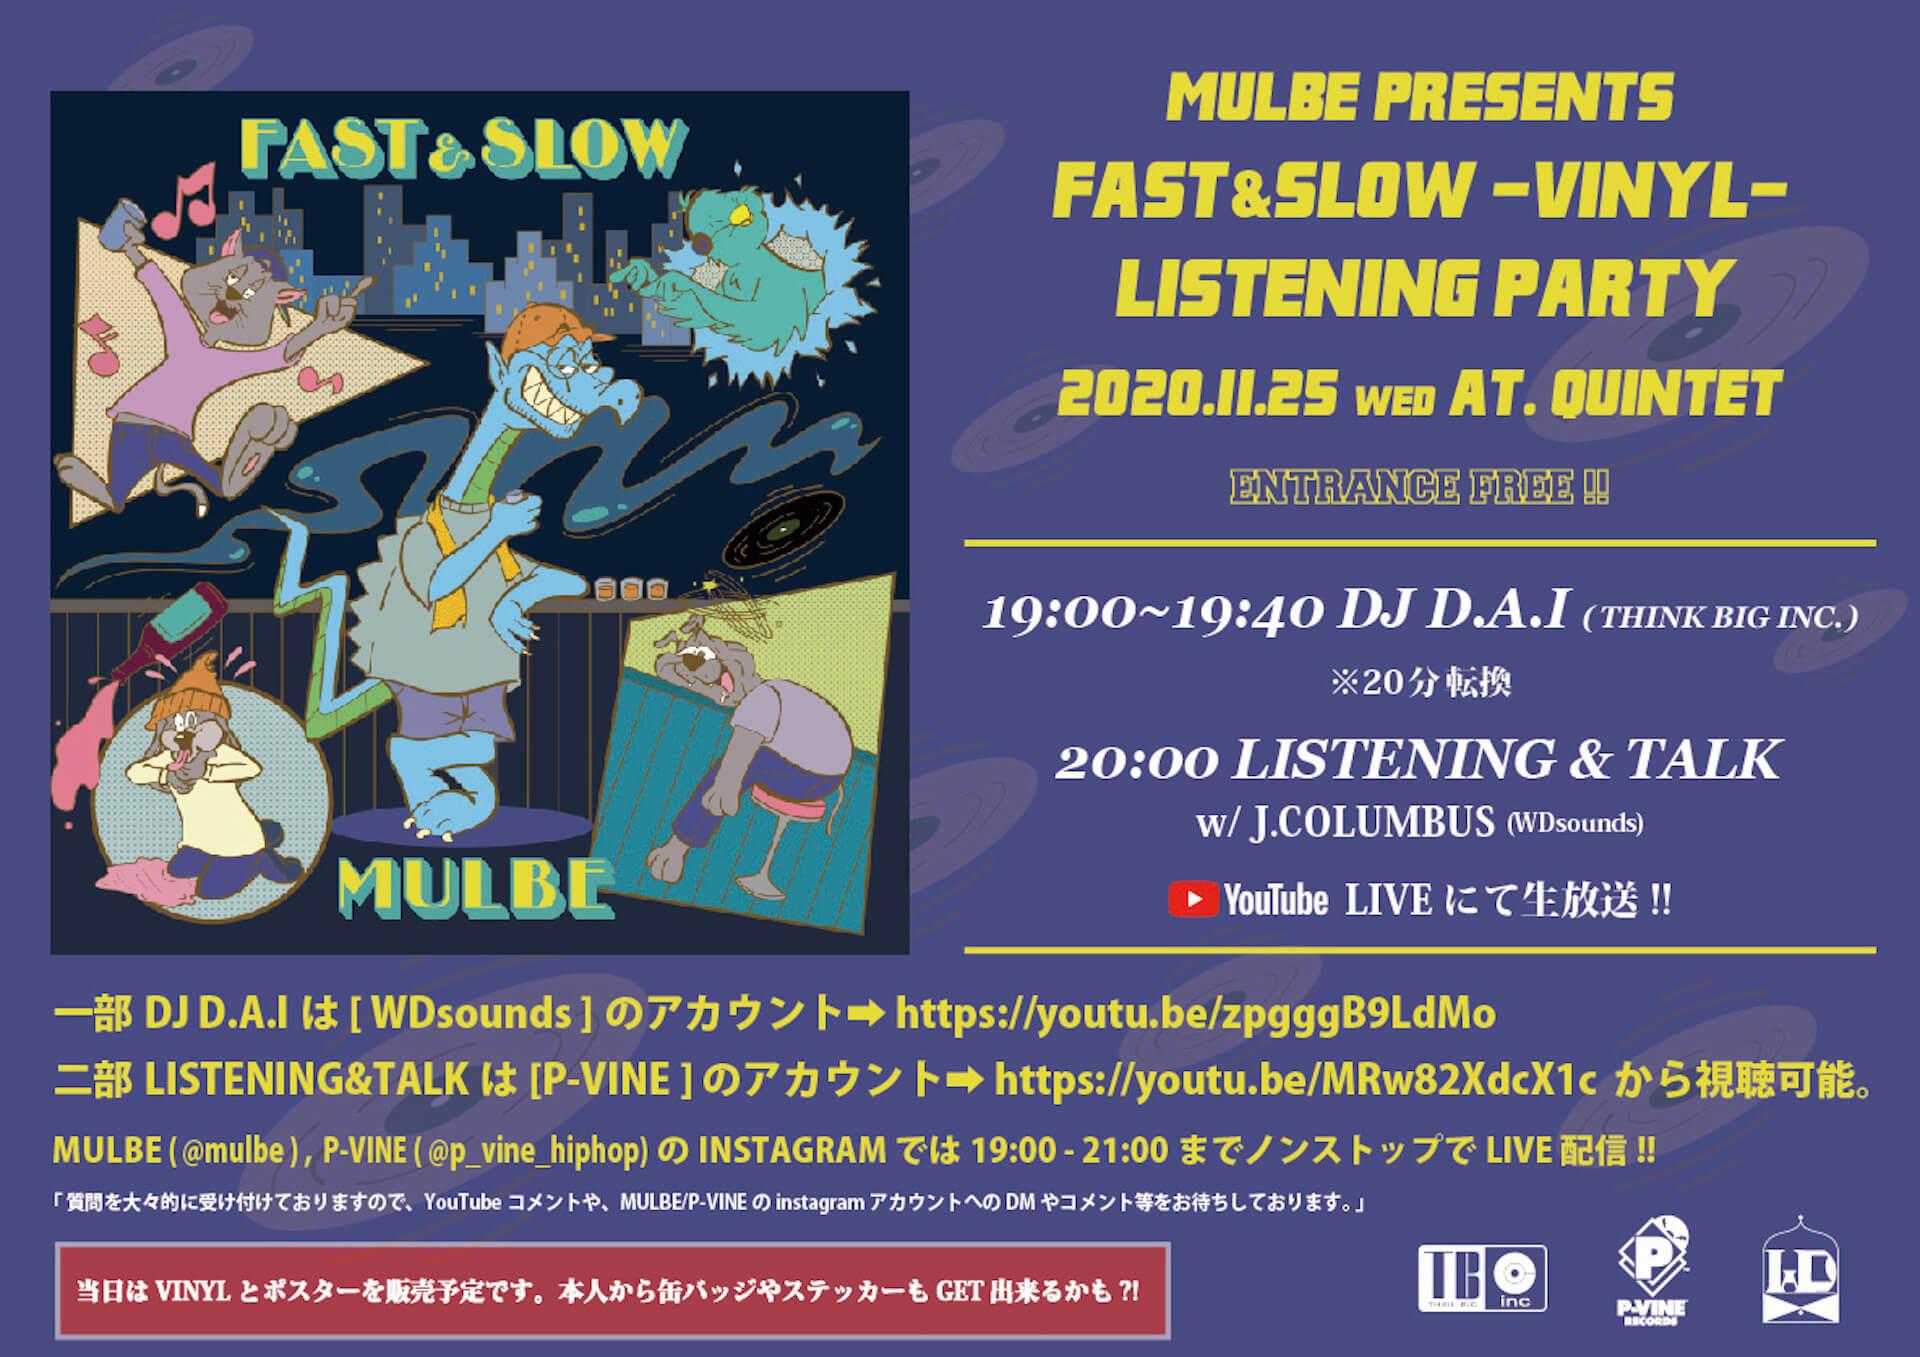 MULBEの1stフルアルバム『FAST&SLOW』のVINYL LISTENING SHOWが本日開催 music201125-mulbe-1